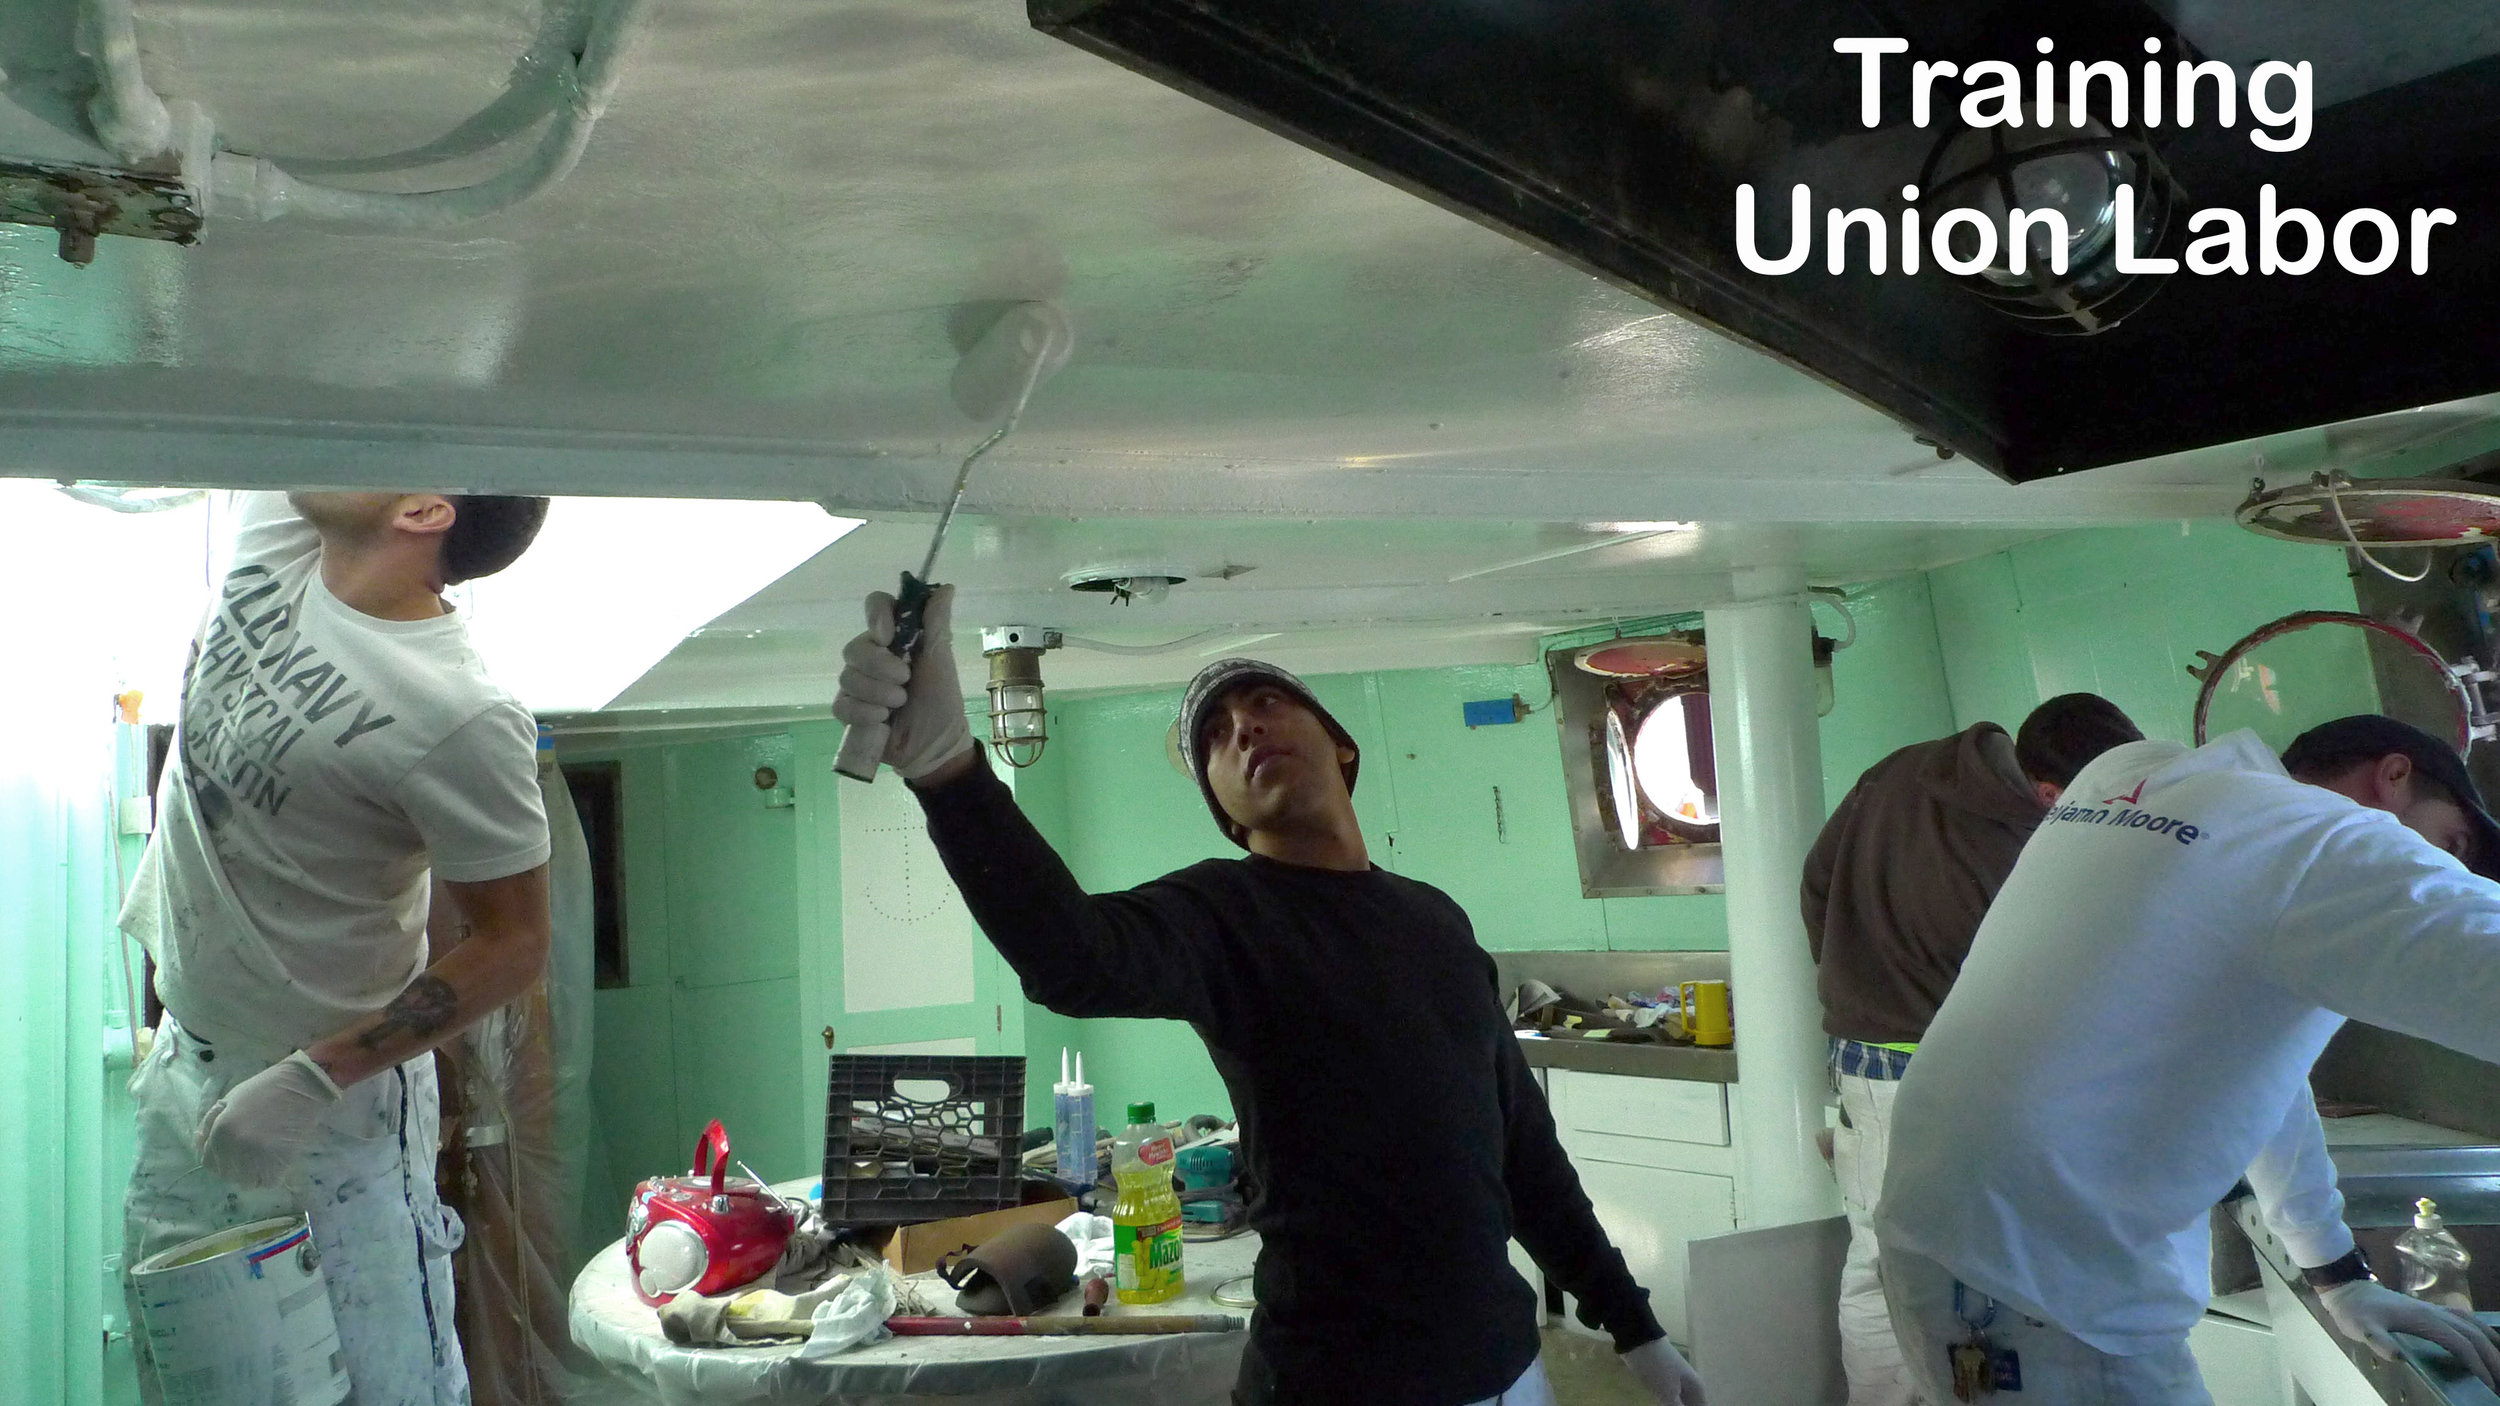 Training Union Labor _140409 DC9 Volunteers  (6) rtch.jpg